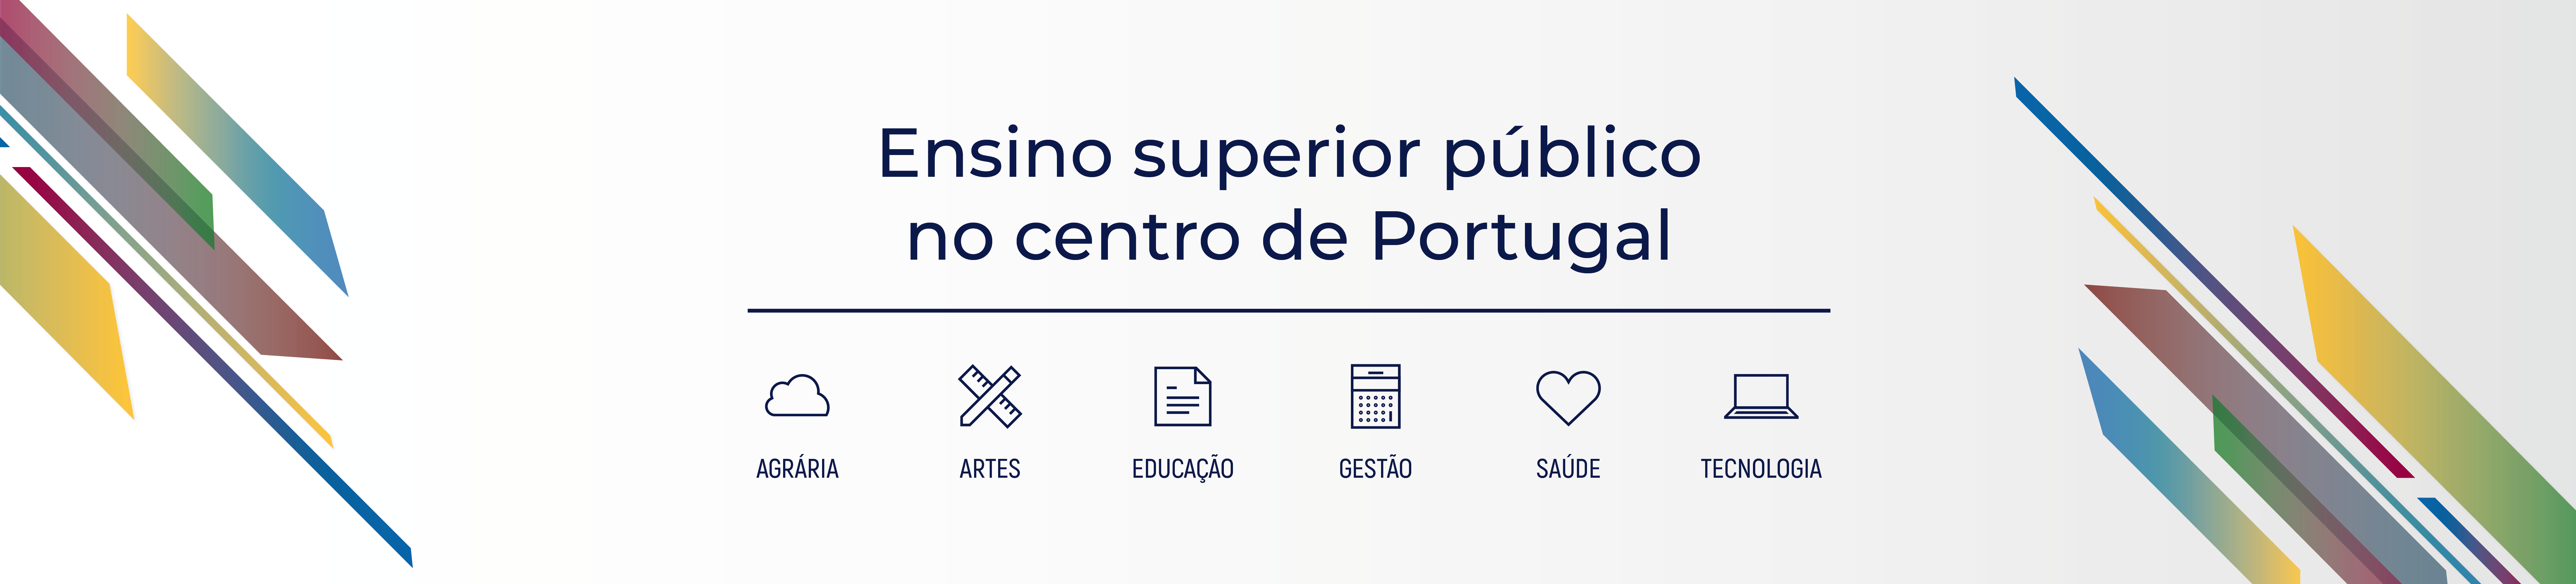 Ensino superior público no centro de Portugal